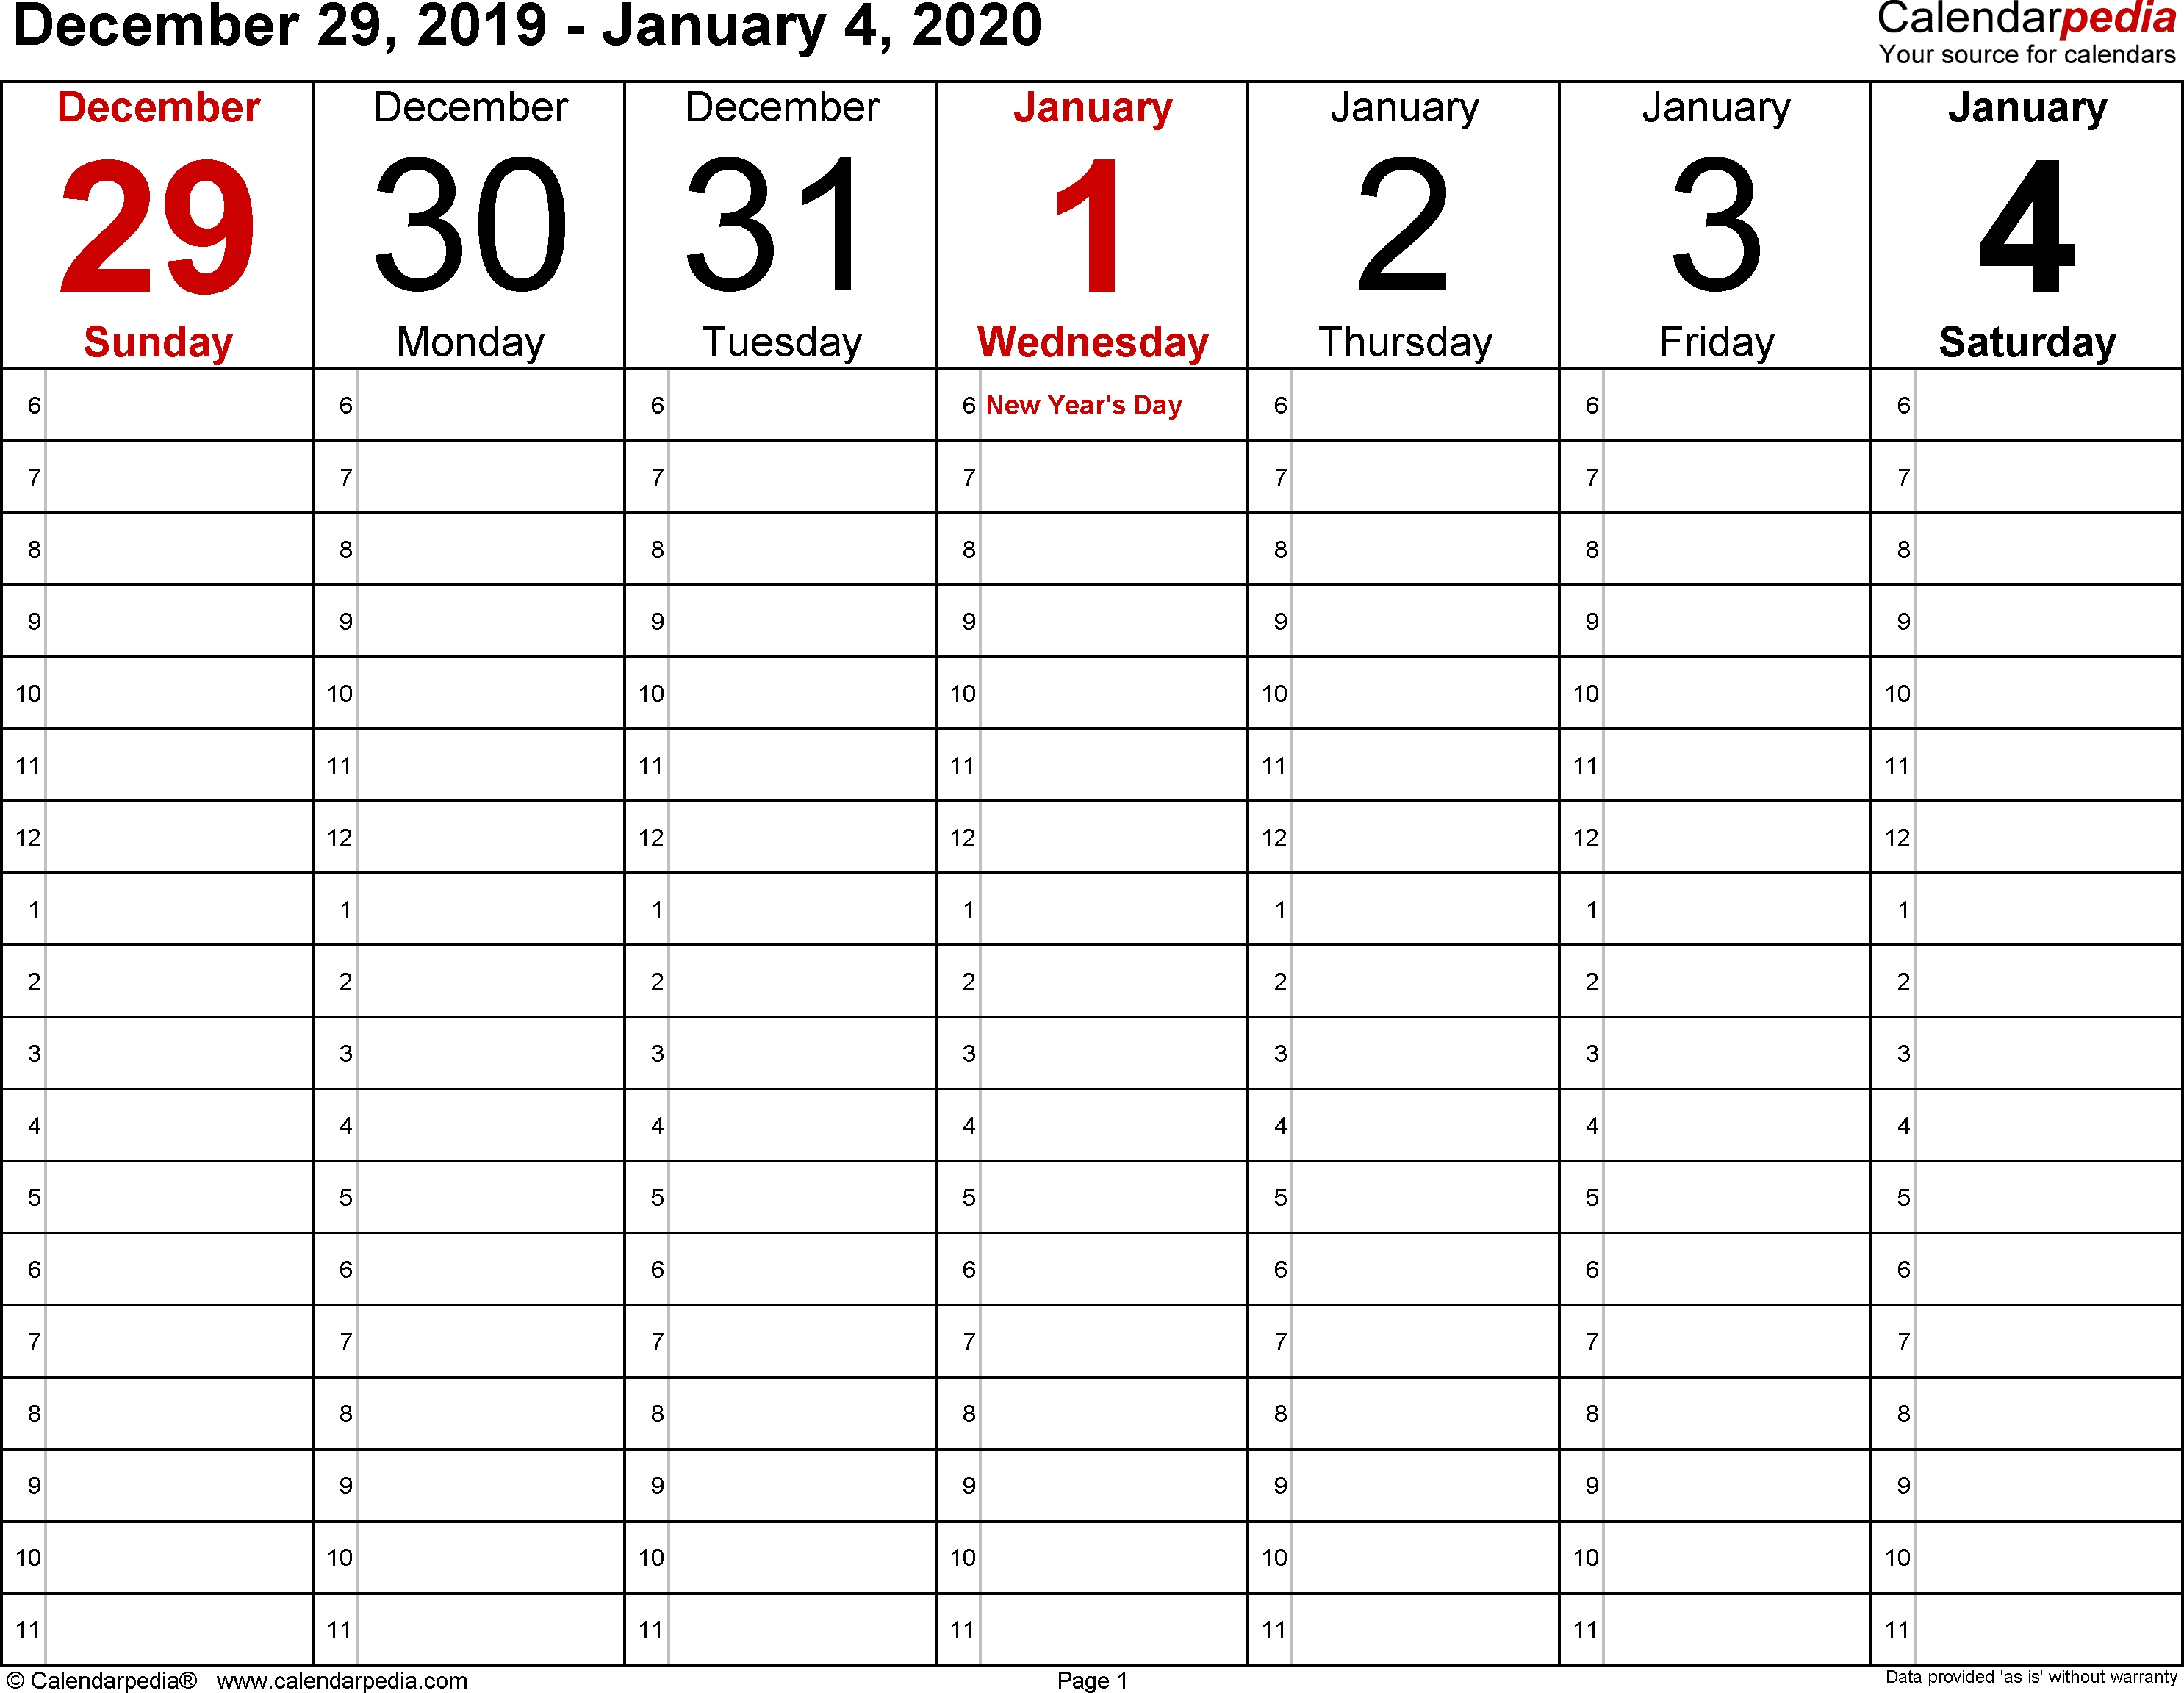 Weekly Calendar Printable 2020 - Wpa.wpart.co-Blank I-9 Form Printable 2020